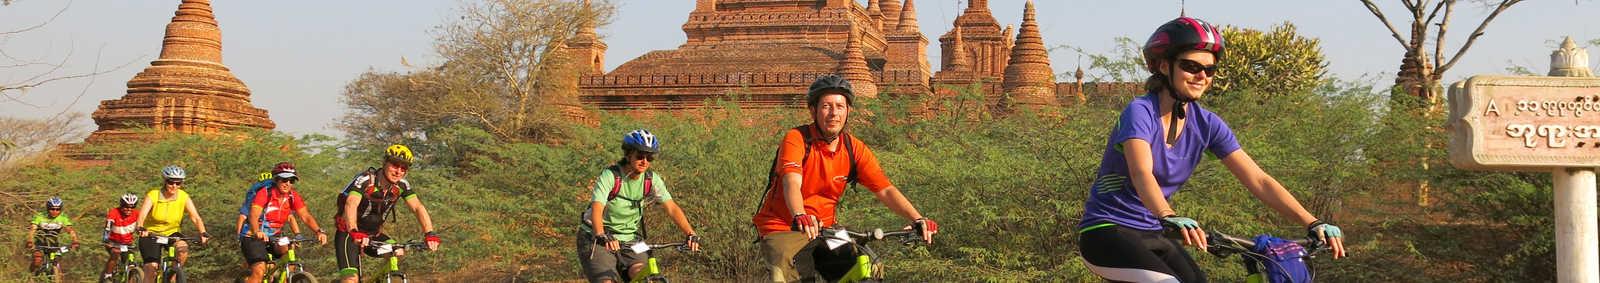 cycling in Burma